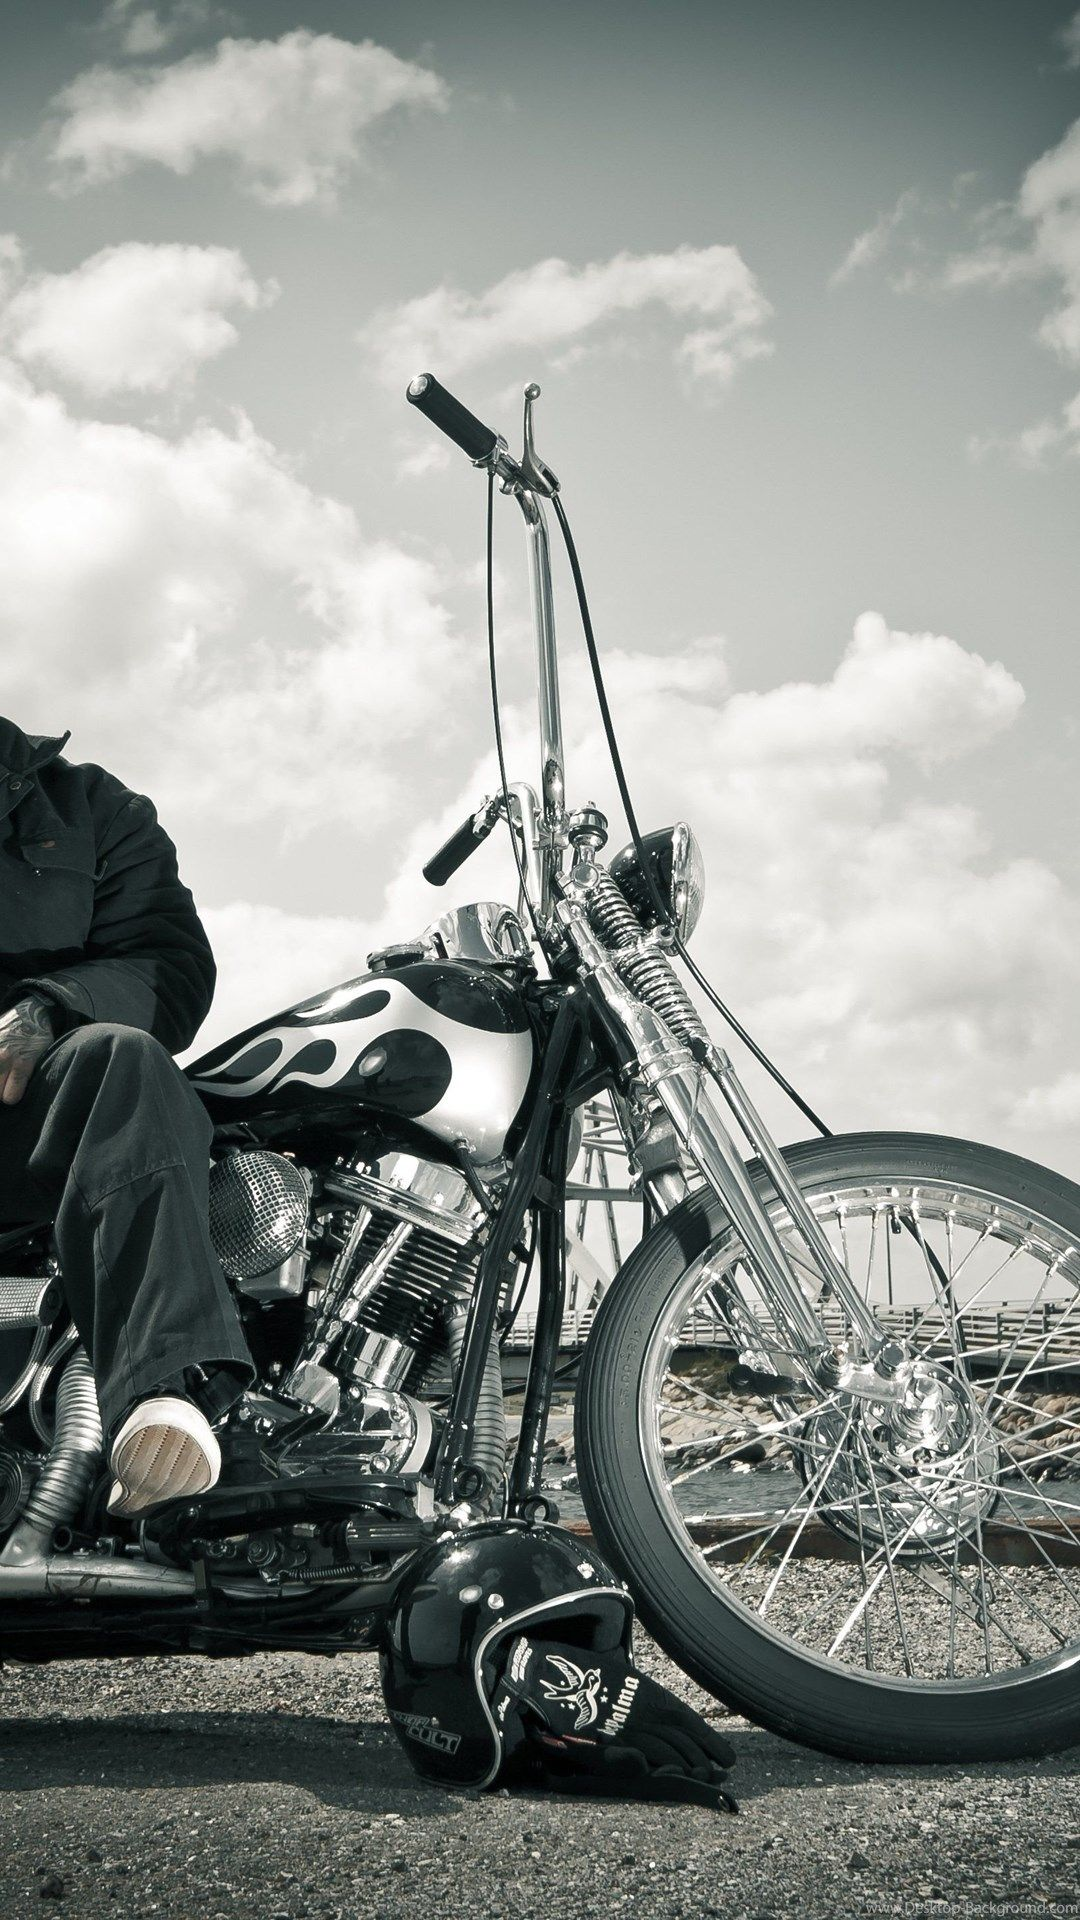 Biker Harley Davidson Chopper Bike Wallpapers Desktop Background